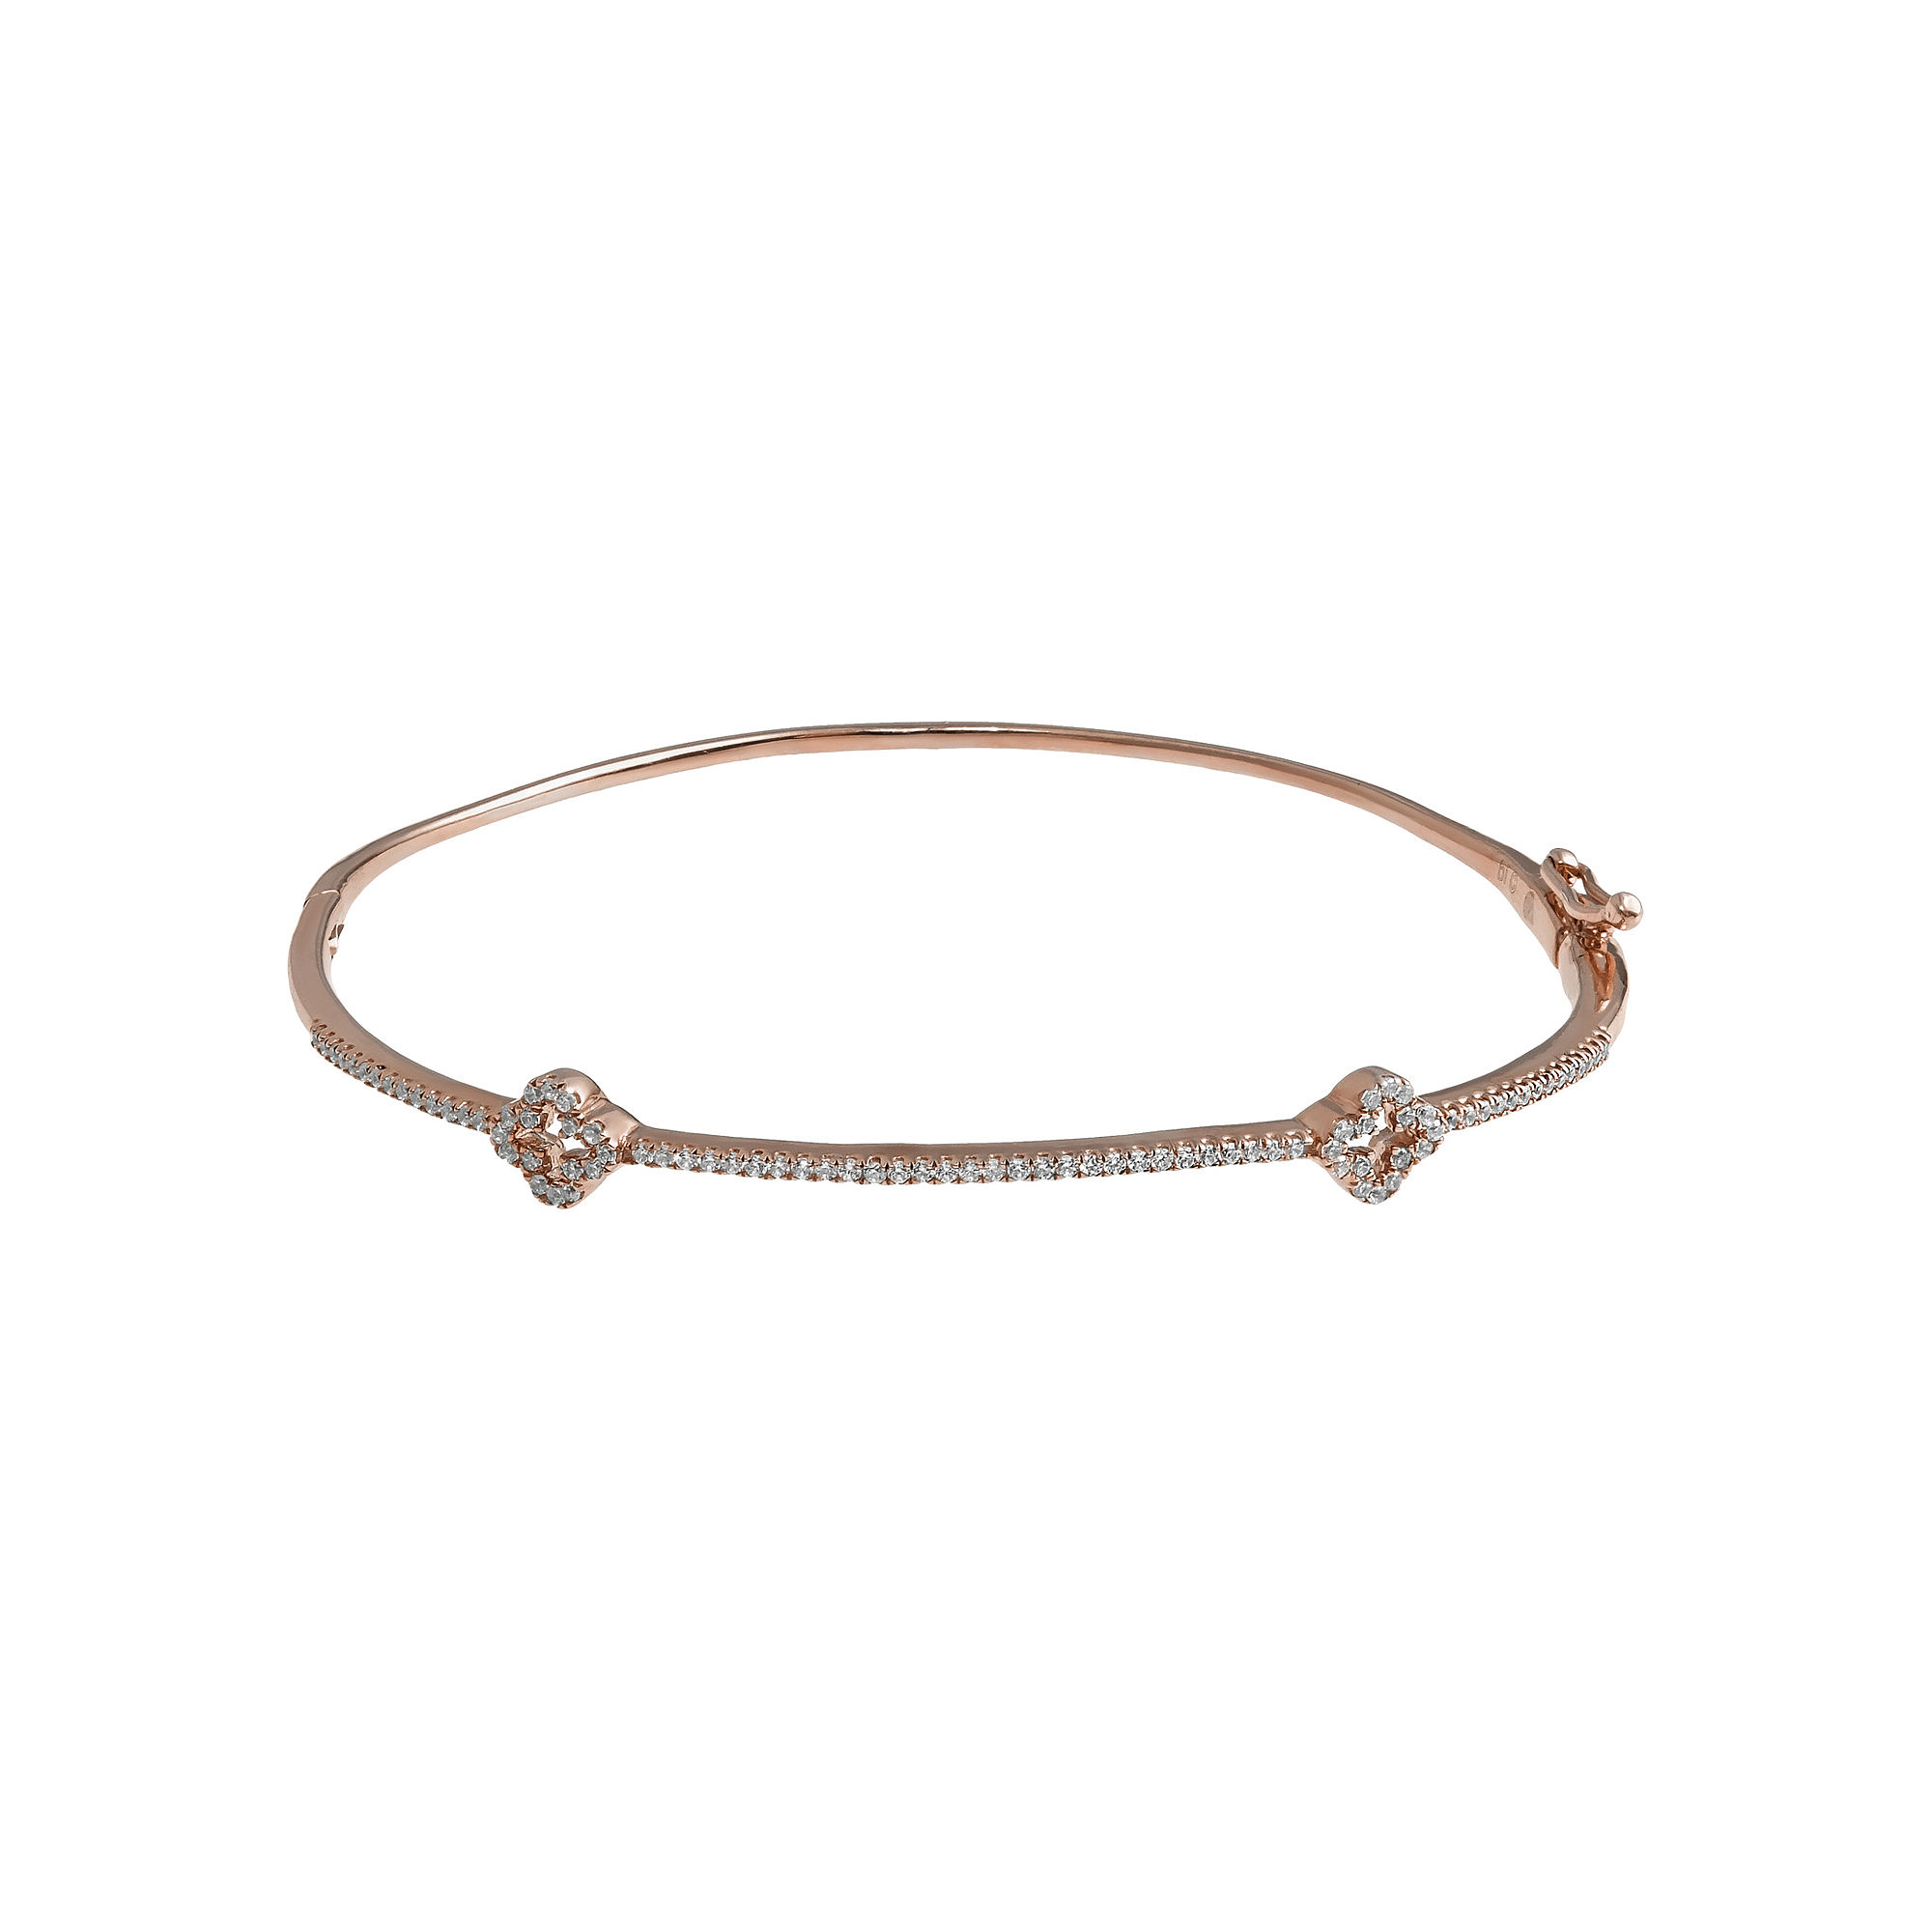 1/4 CT. T.W. Diamond 14K Rose Gold Bangle Bracelet